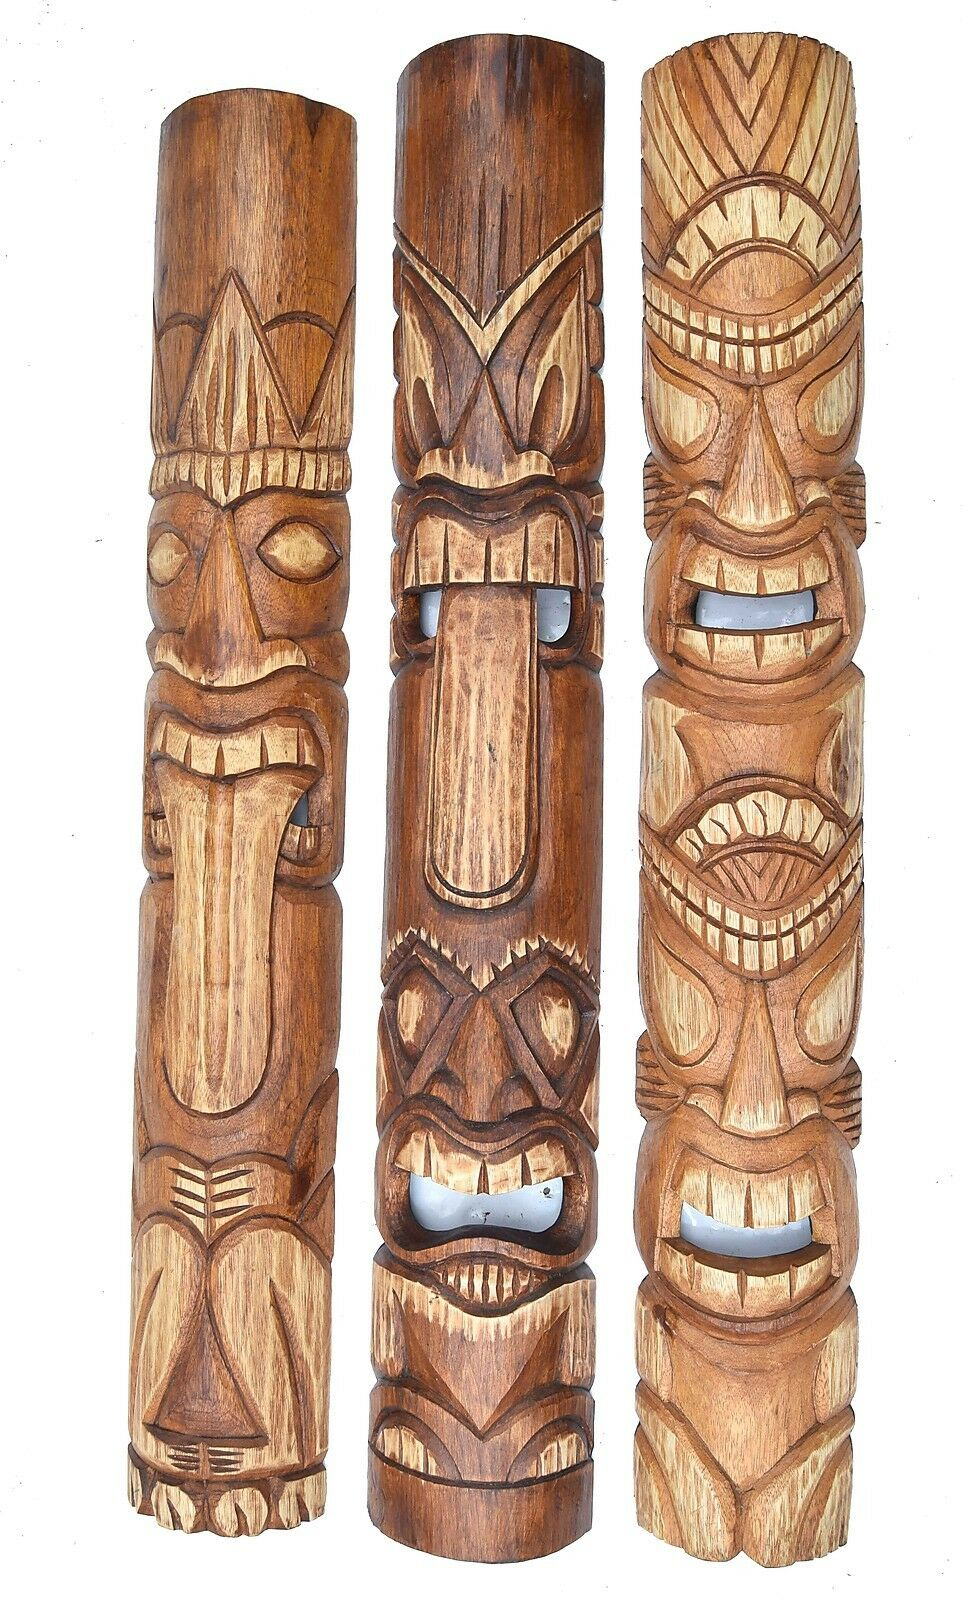 3 Tiki muro maschera 100cm nel Hawaii Style maschera di legno legno Tiki MASCHERA MASCHERE muro Maui